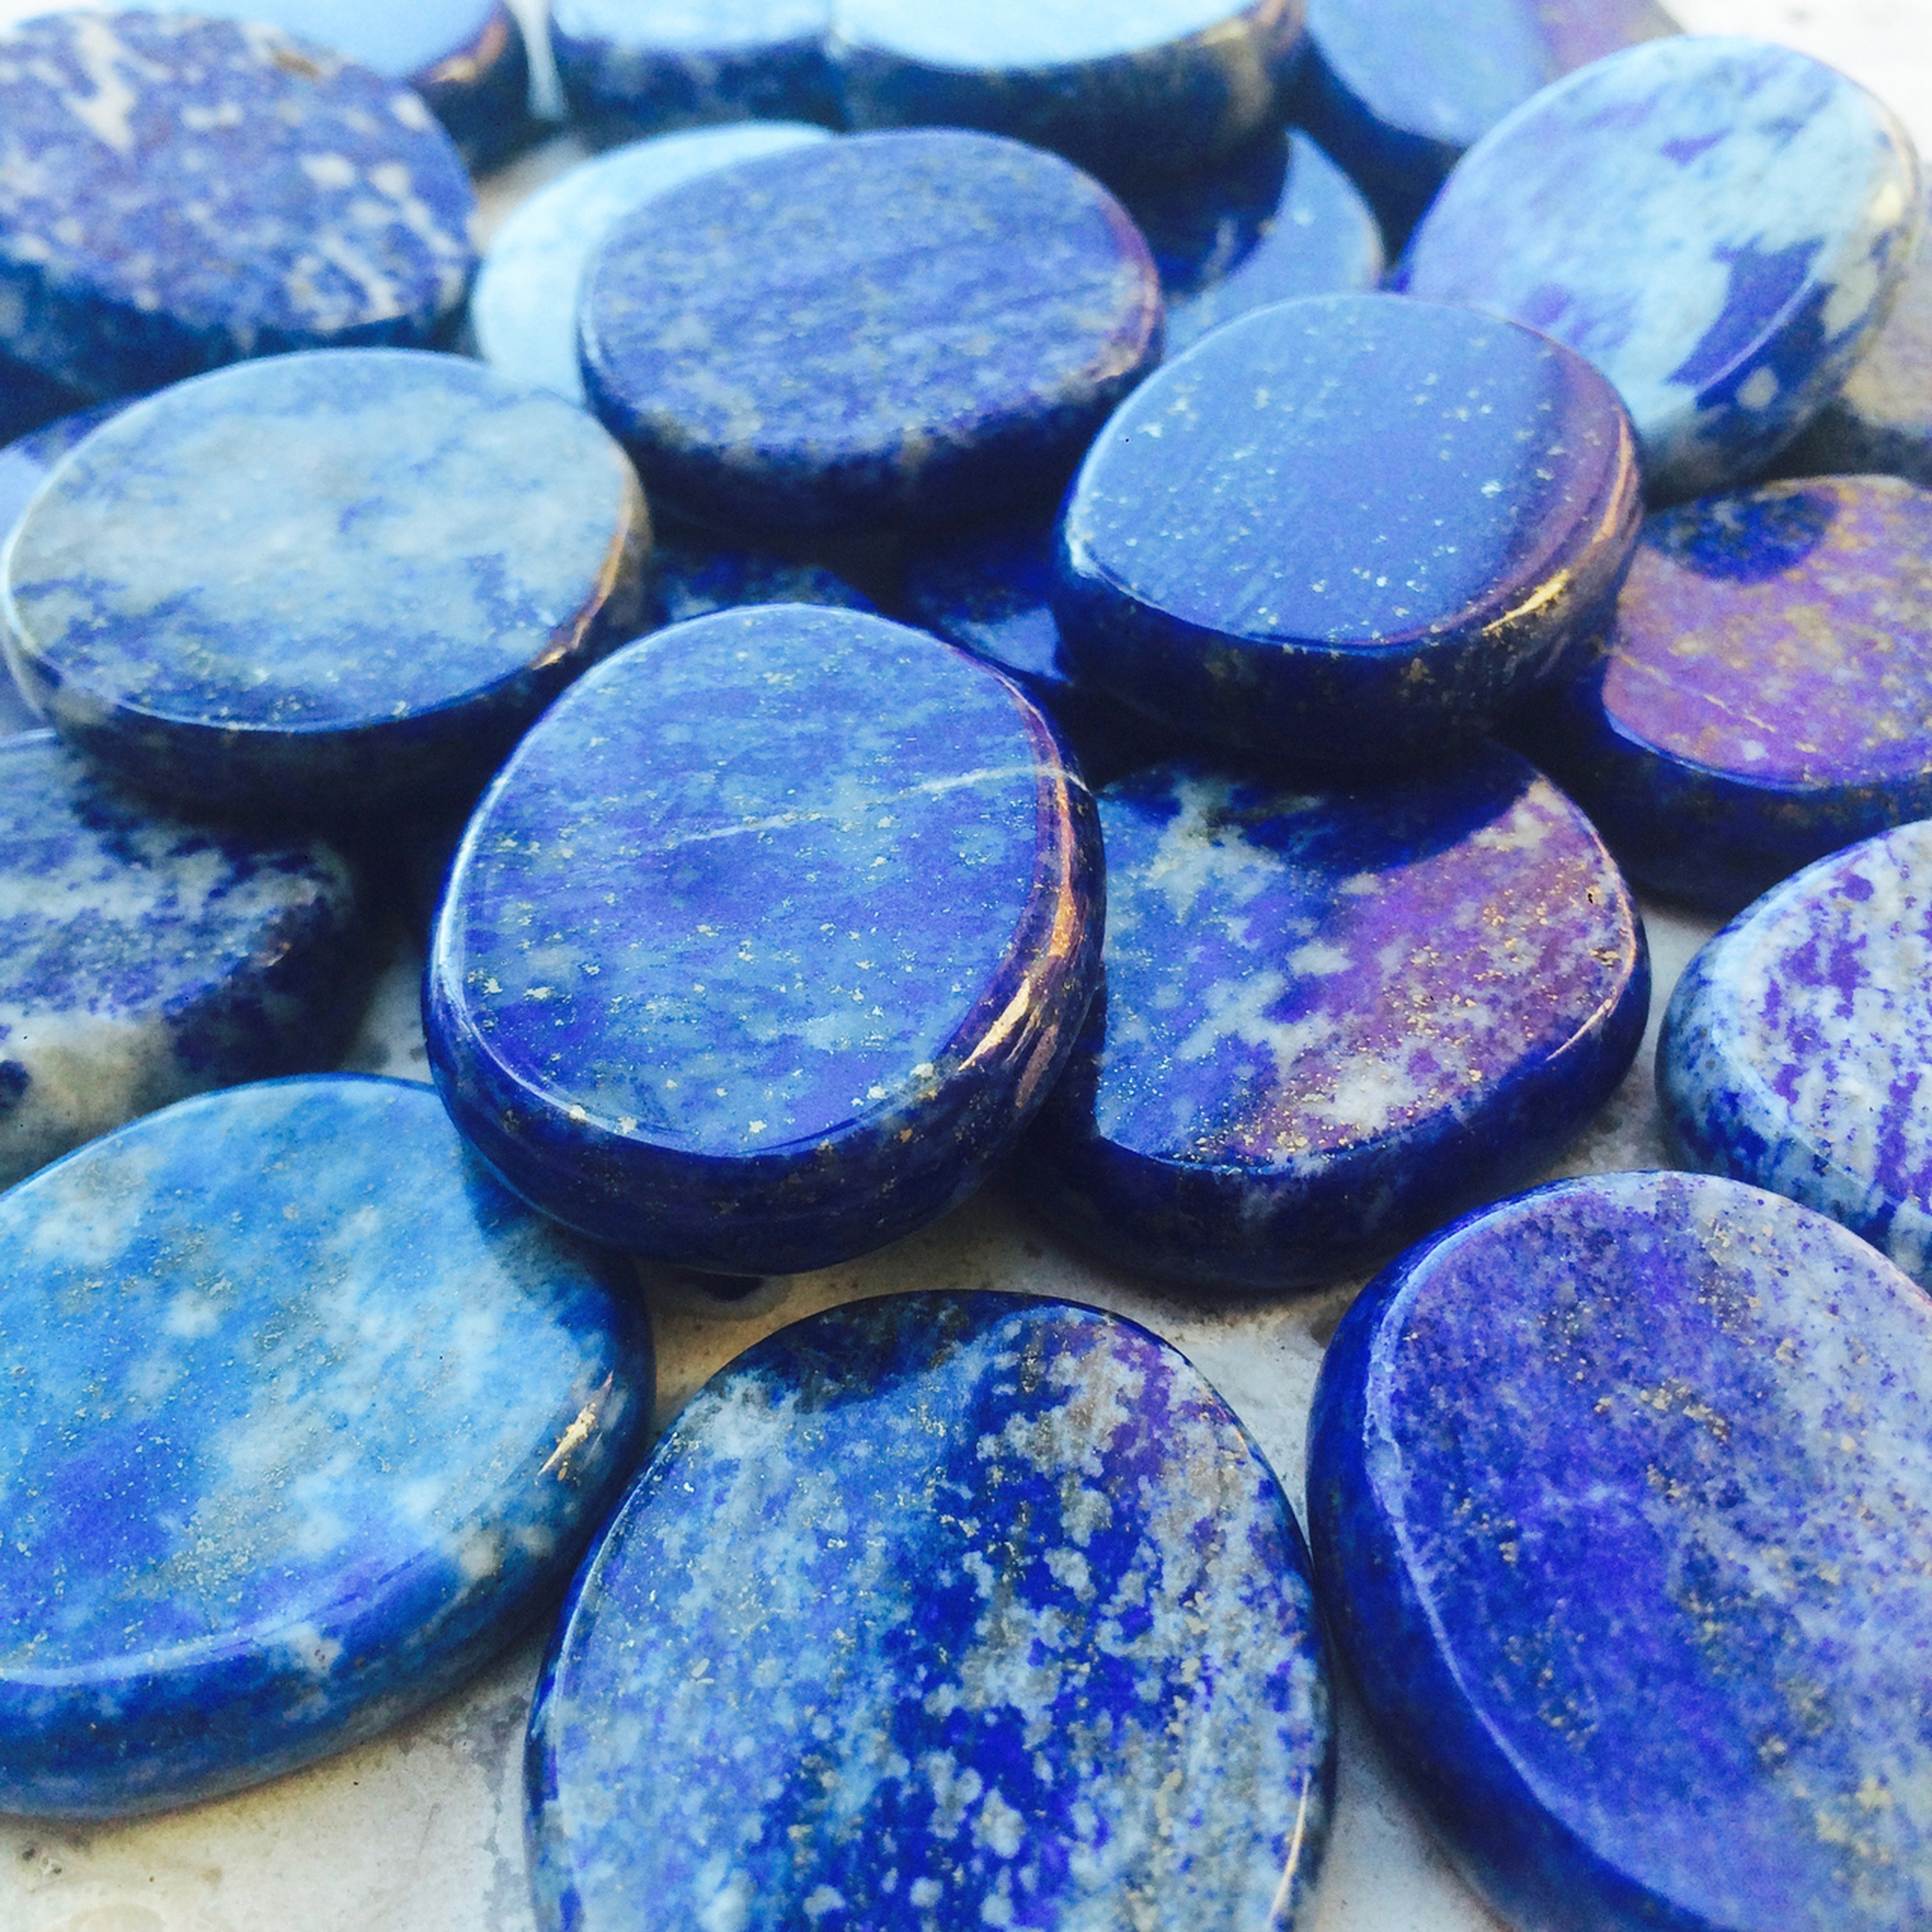 lapis lazuli gemstone medallions the ancient stone of knowledge